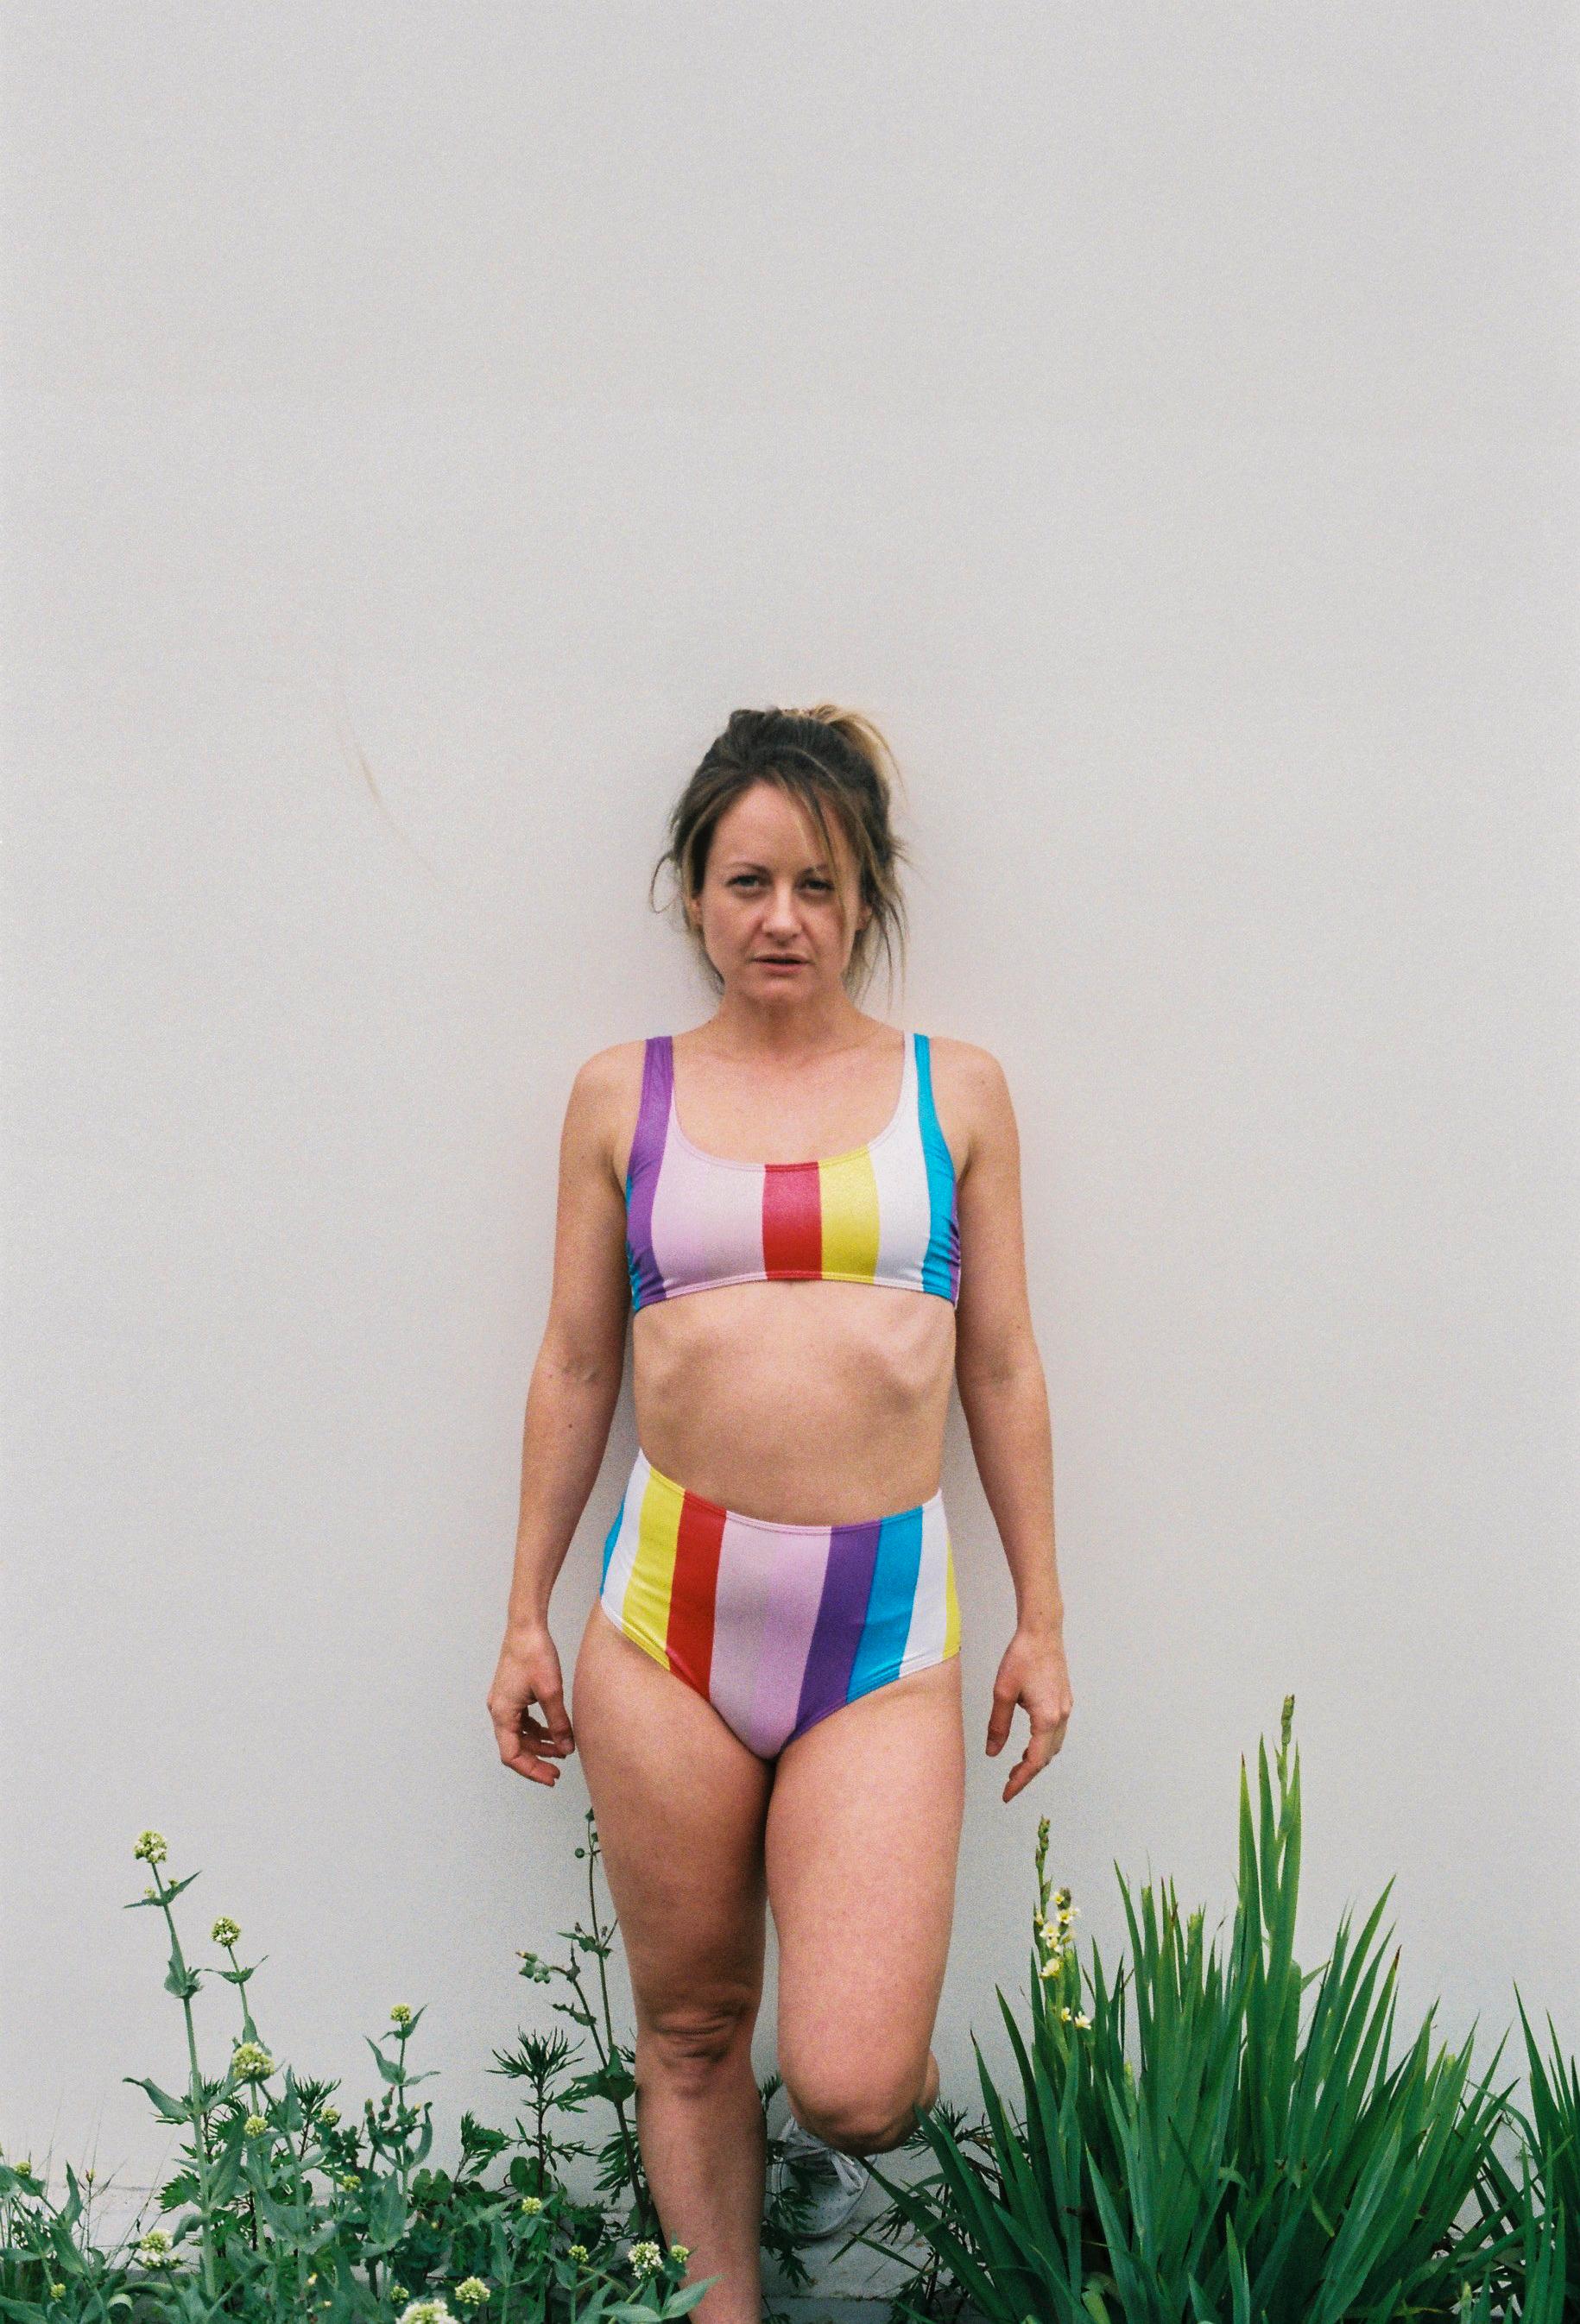 les rituelles edito maillots de bain swimwear vintage feel paris eshop lingerie_09.jpg